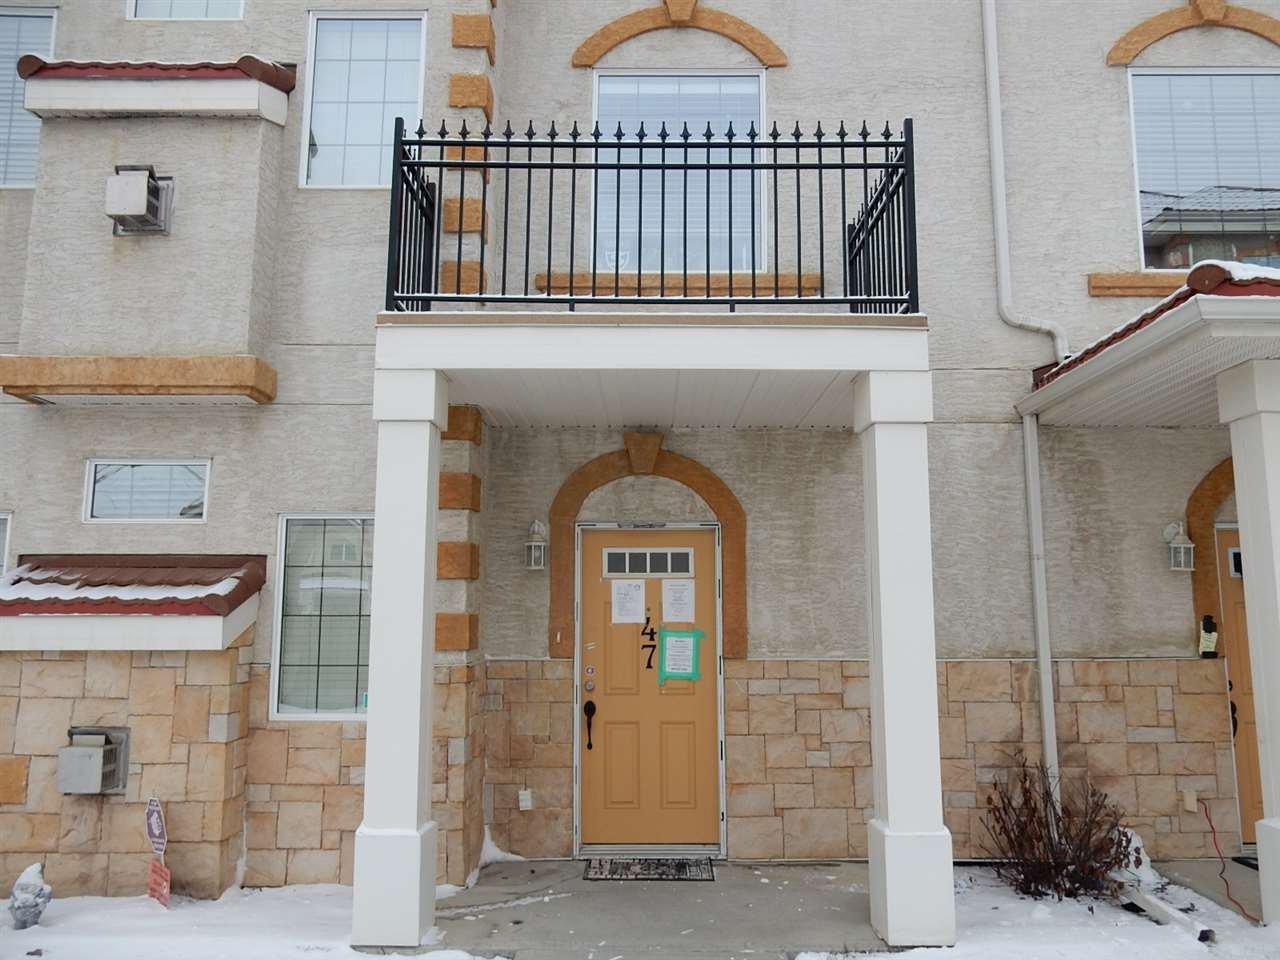 Main Photo: 47 13825 155 Avenue in Edmonton: Zone 27 Townhouse for sale : MLS®# E4185619